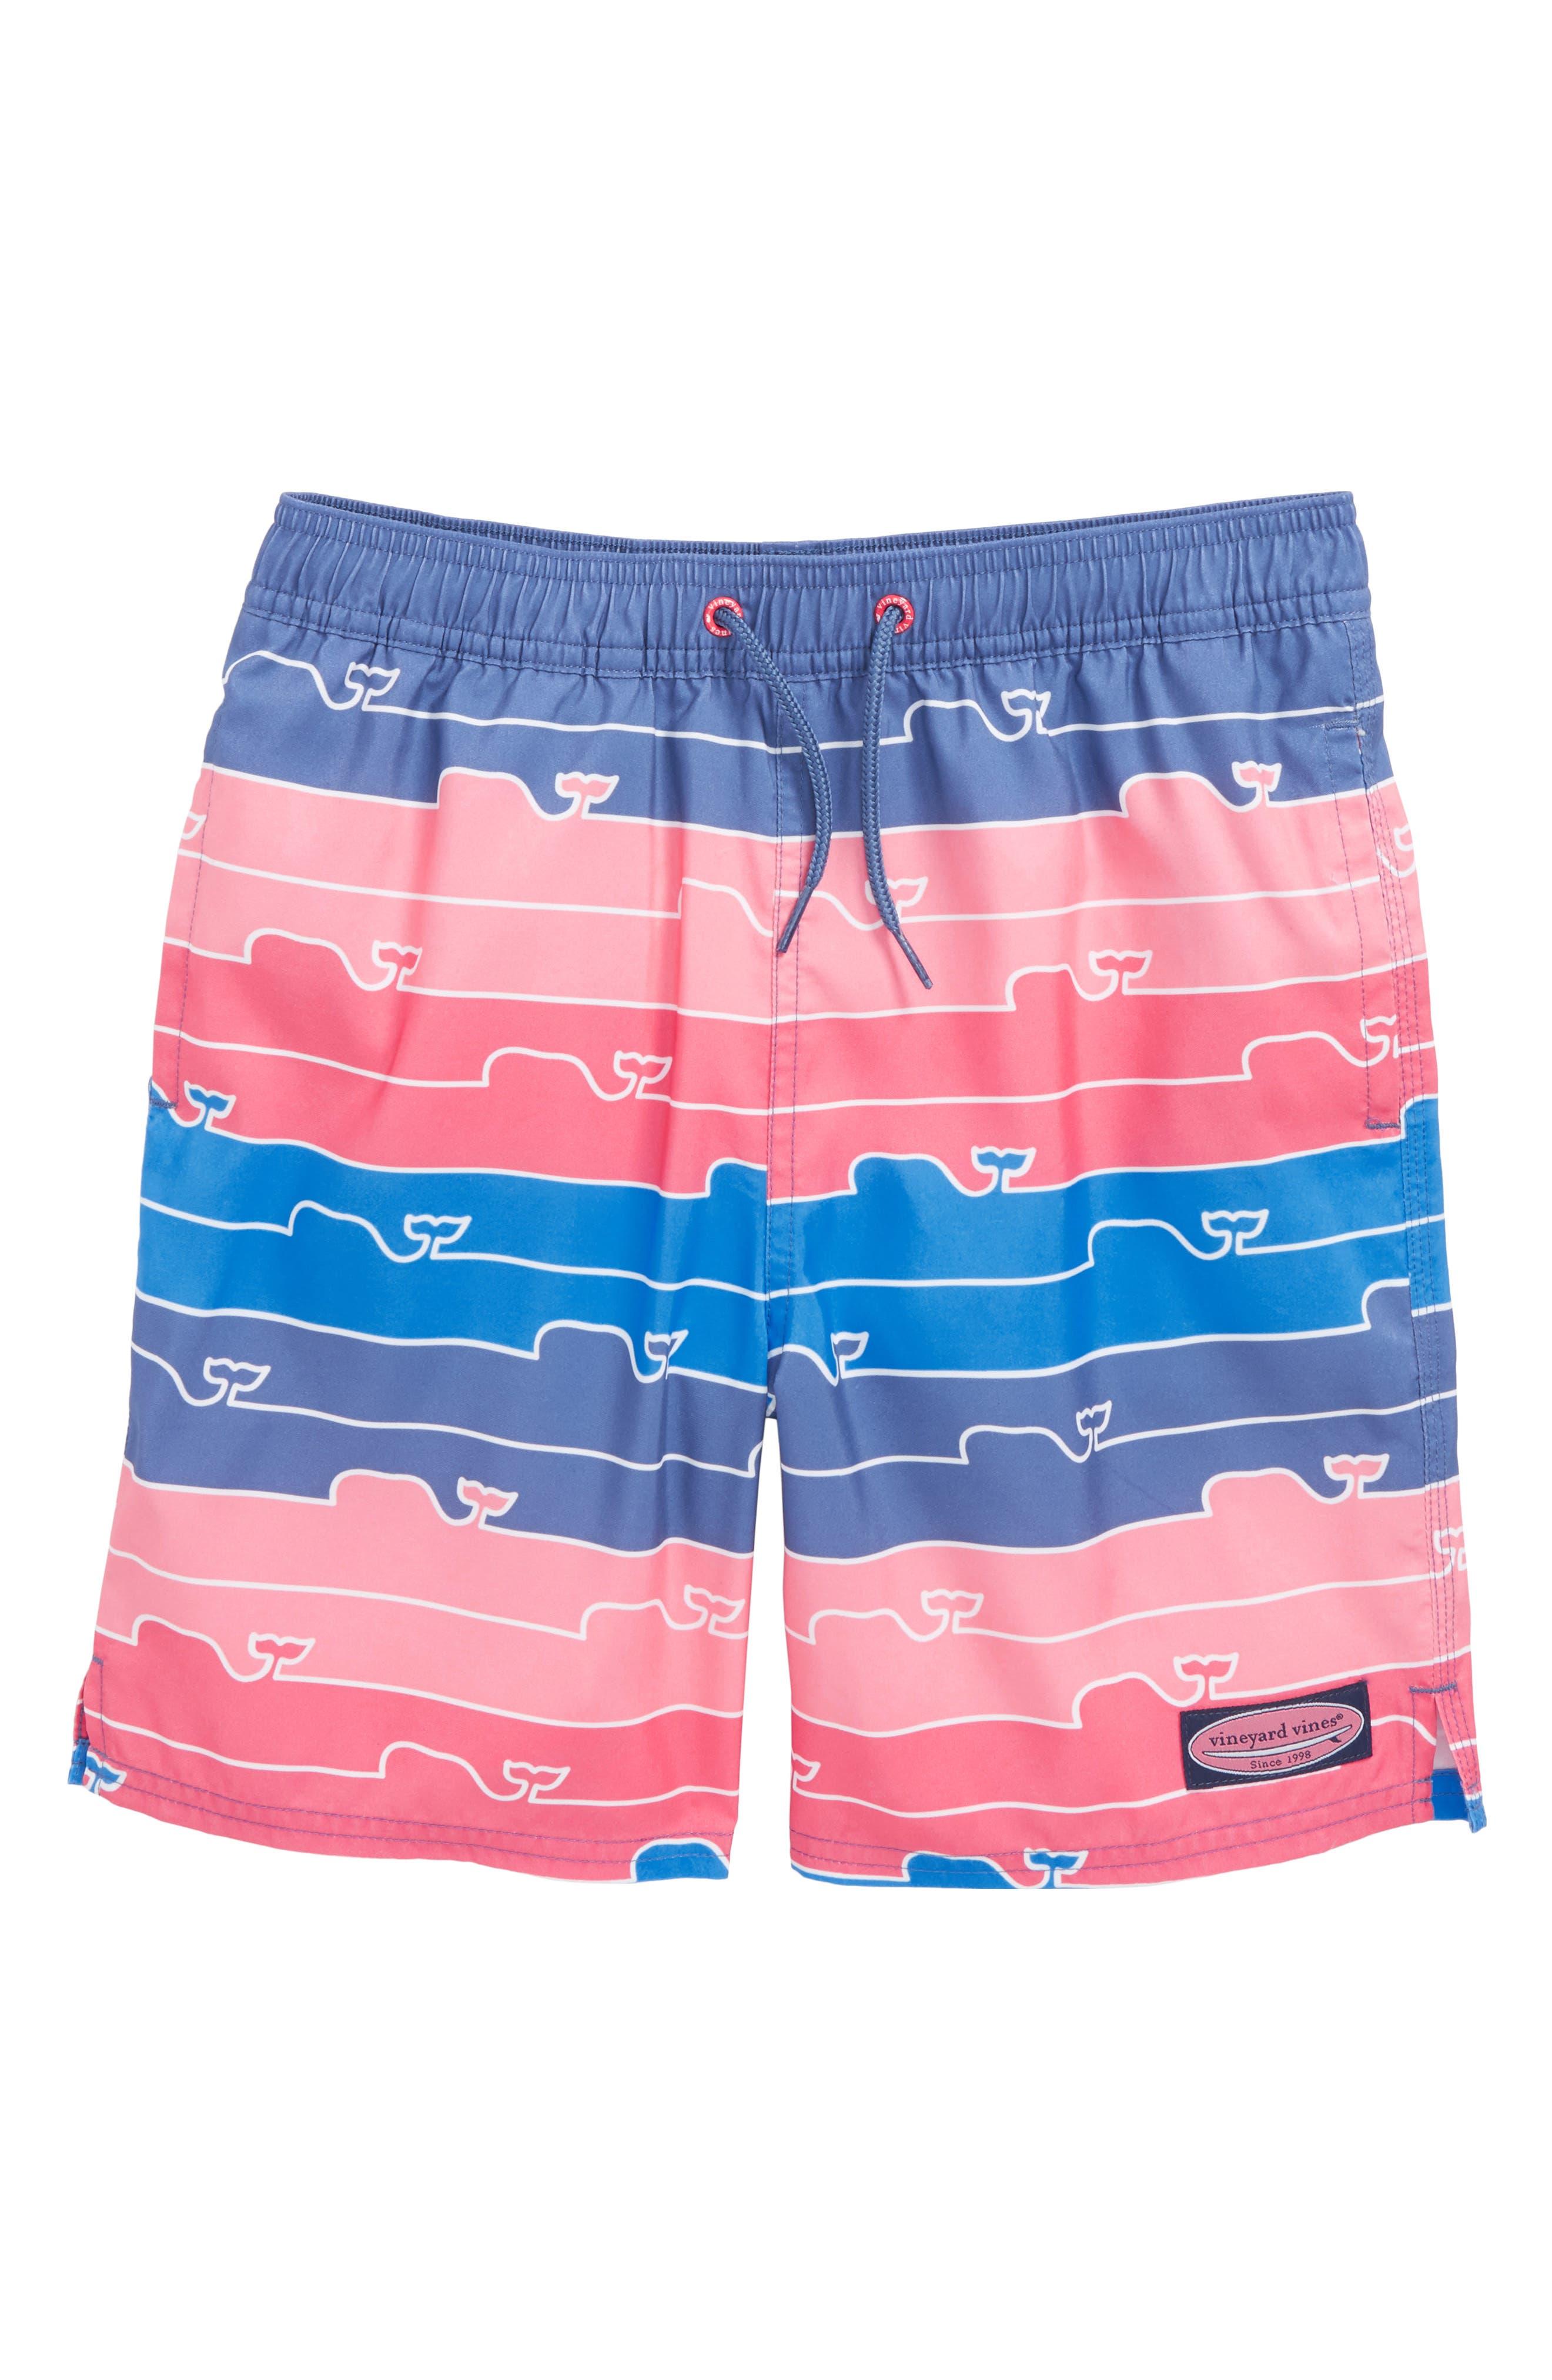 Chappy Whale Line Swim Trunks,                         Main,                         color, Moonshine